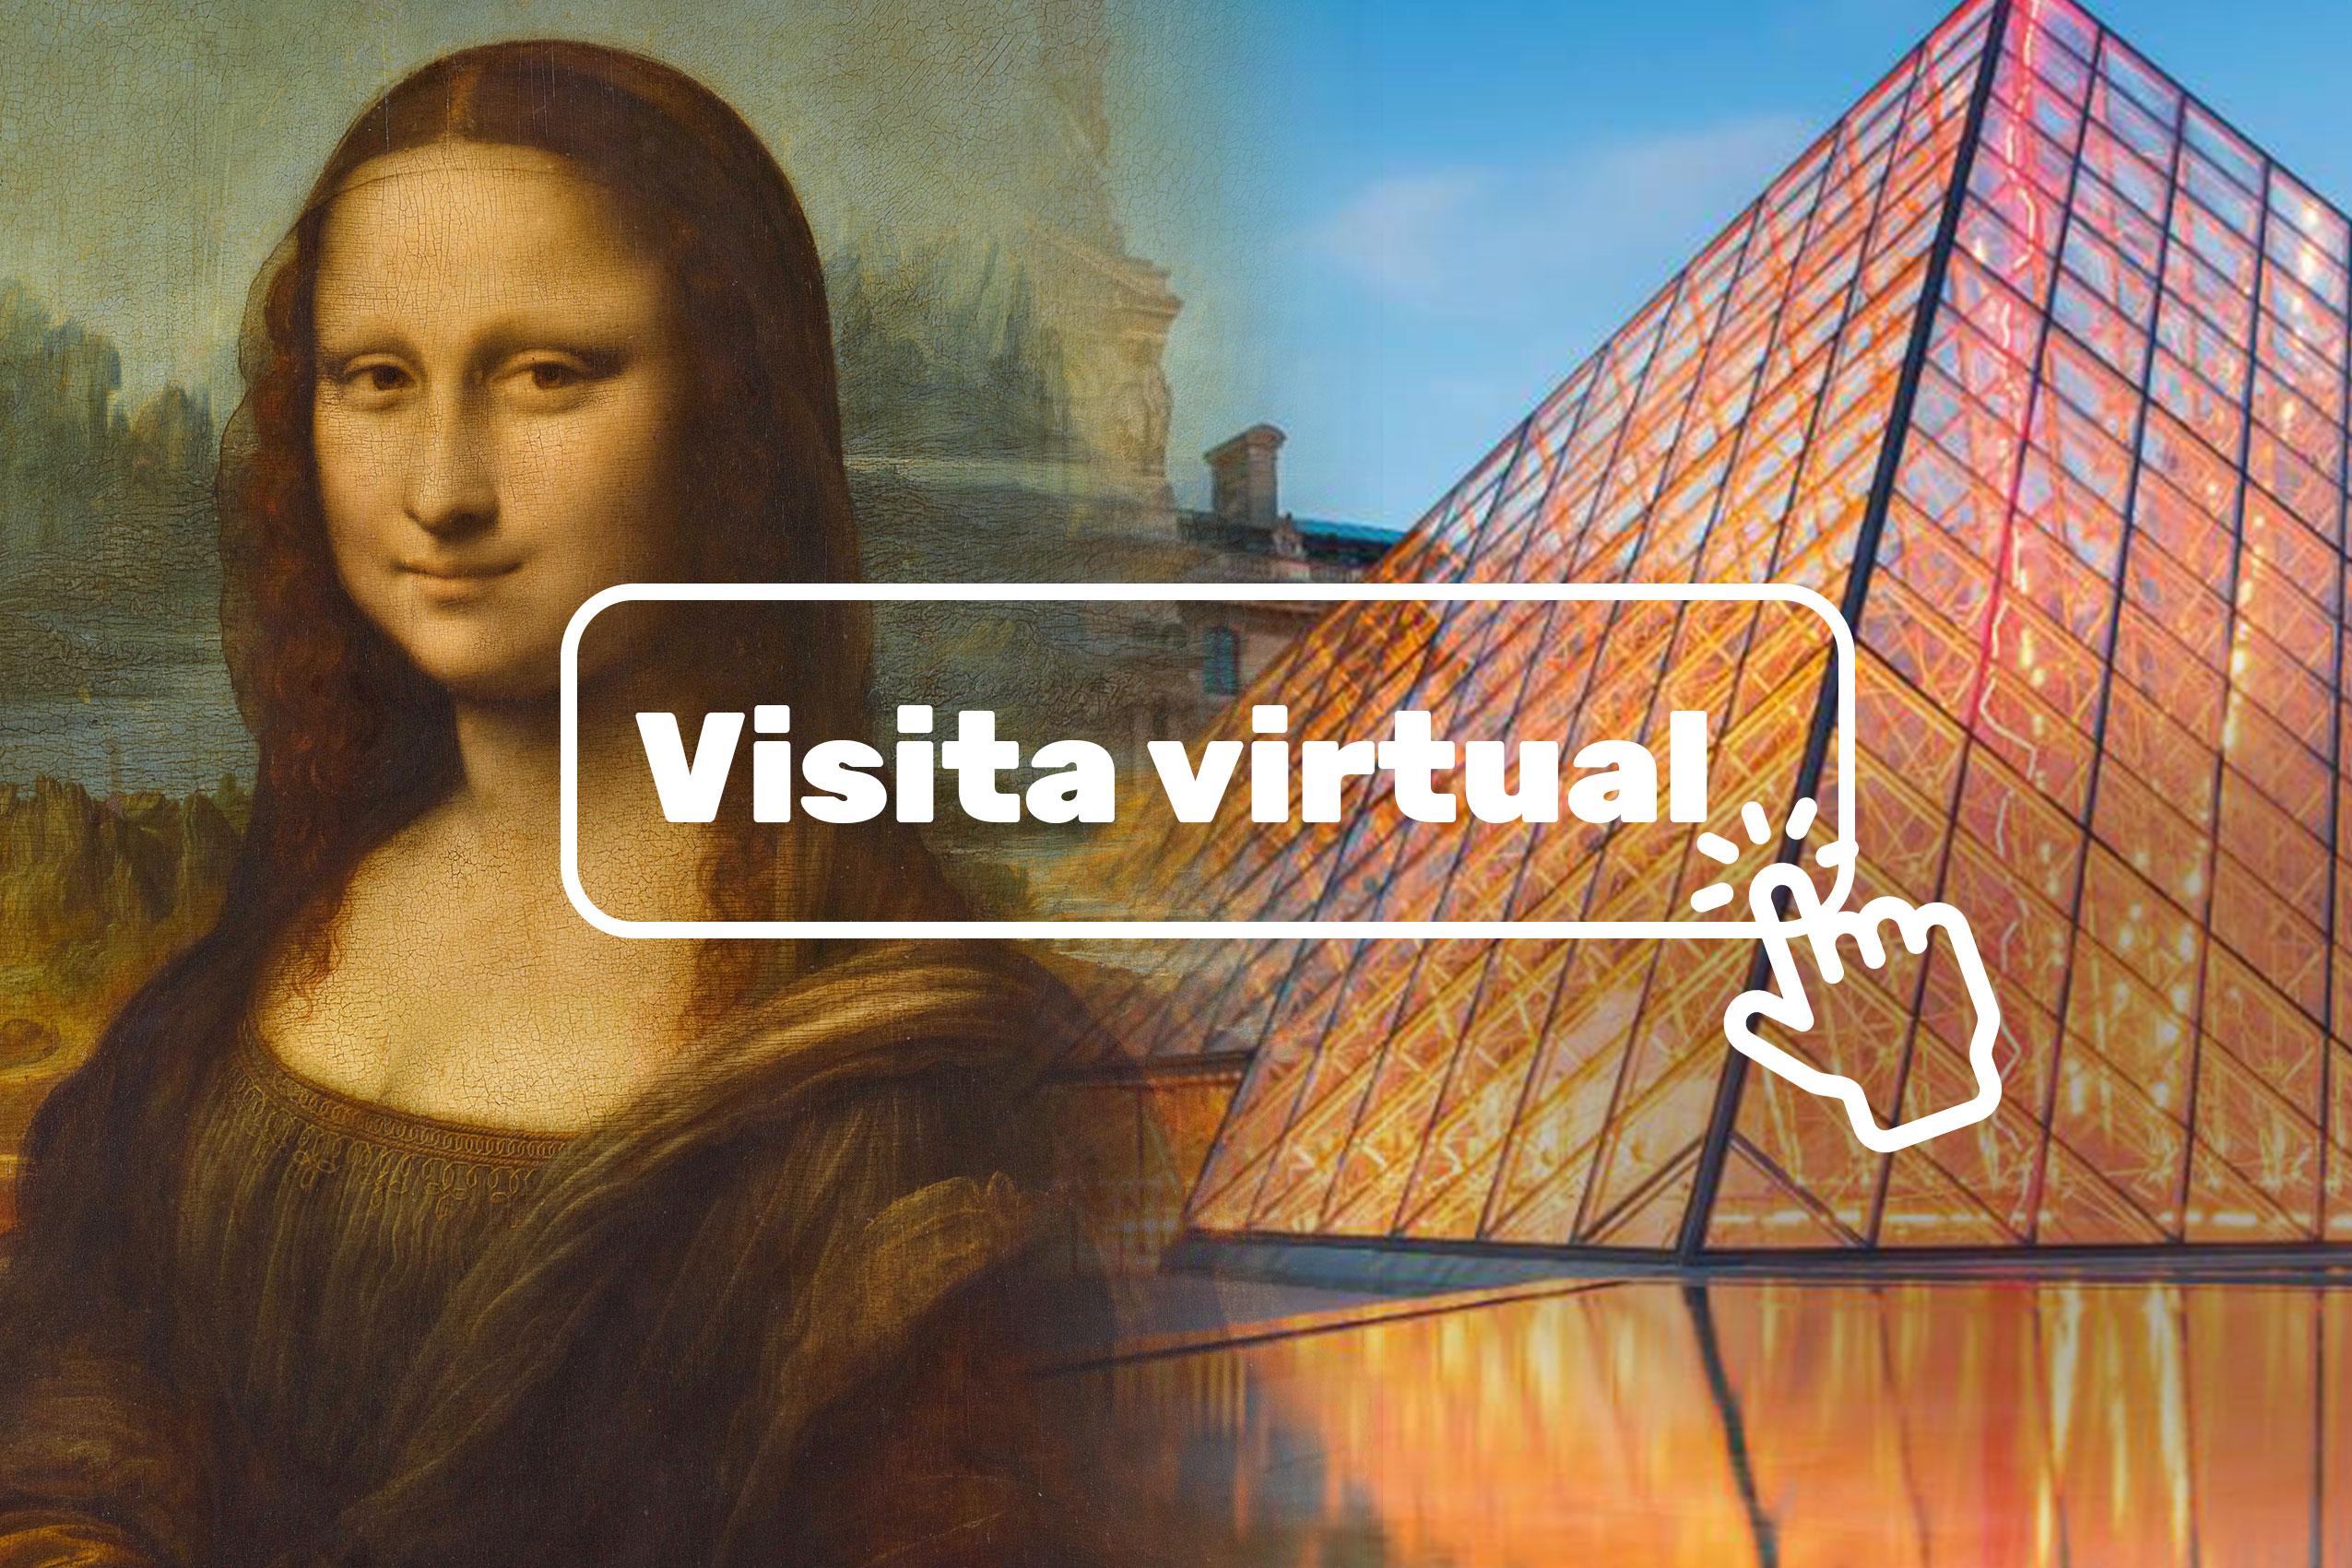 museo-louvre-visita-virtual-360-visitar